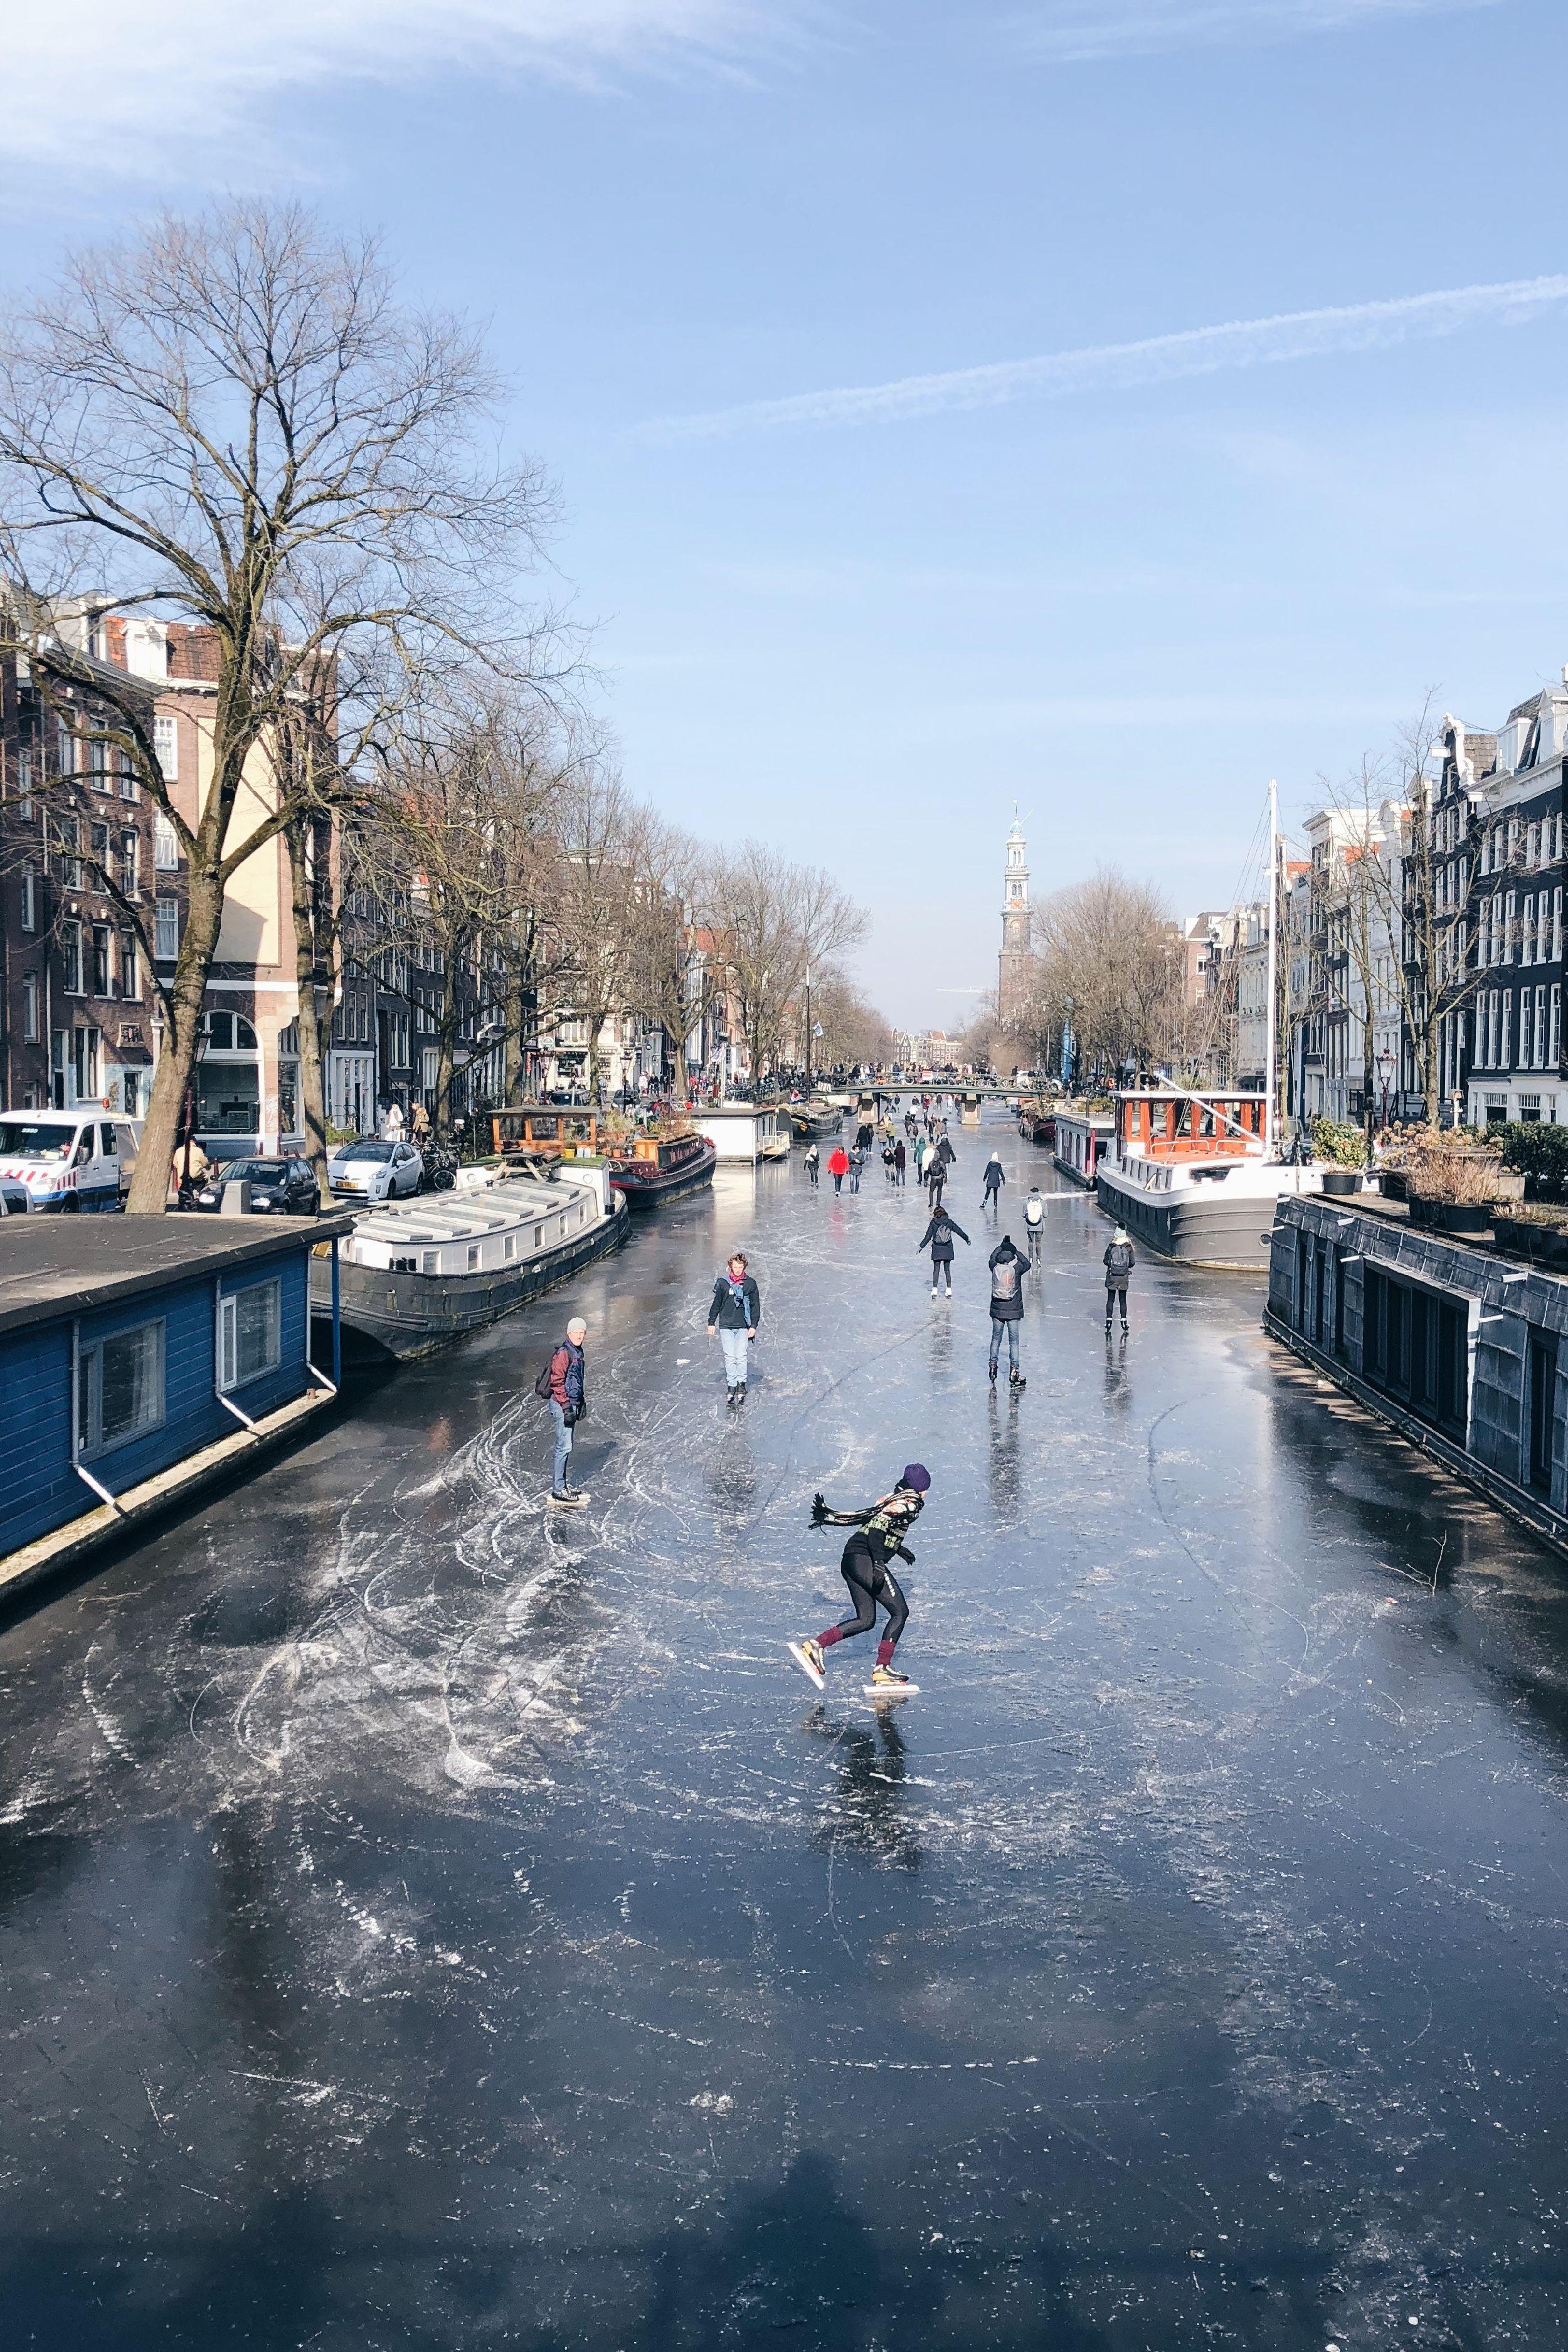 Netherlands Amsterdam Van Der Valk Hotel For 3 Nights Amsterdam Travel Amsterdam Things To Do In Amsterdam Itinerary